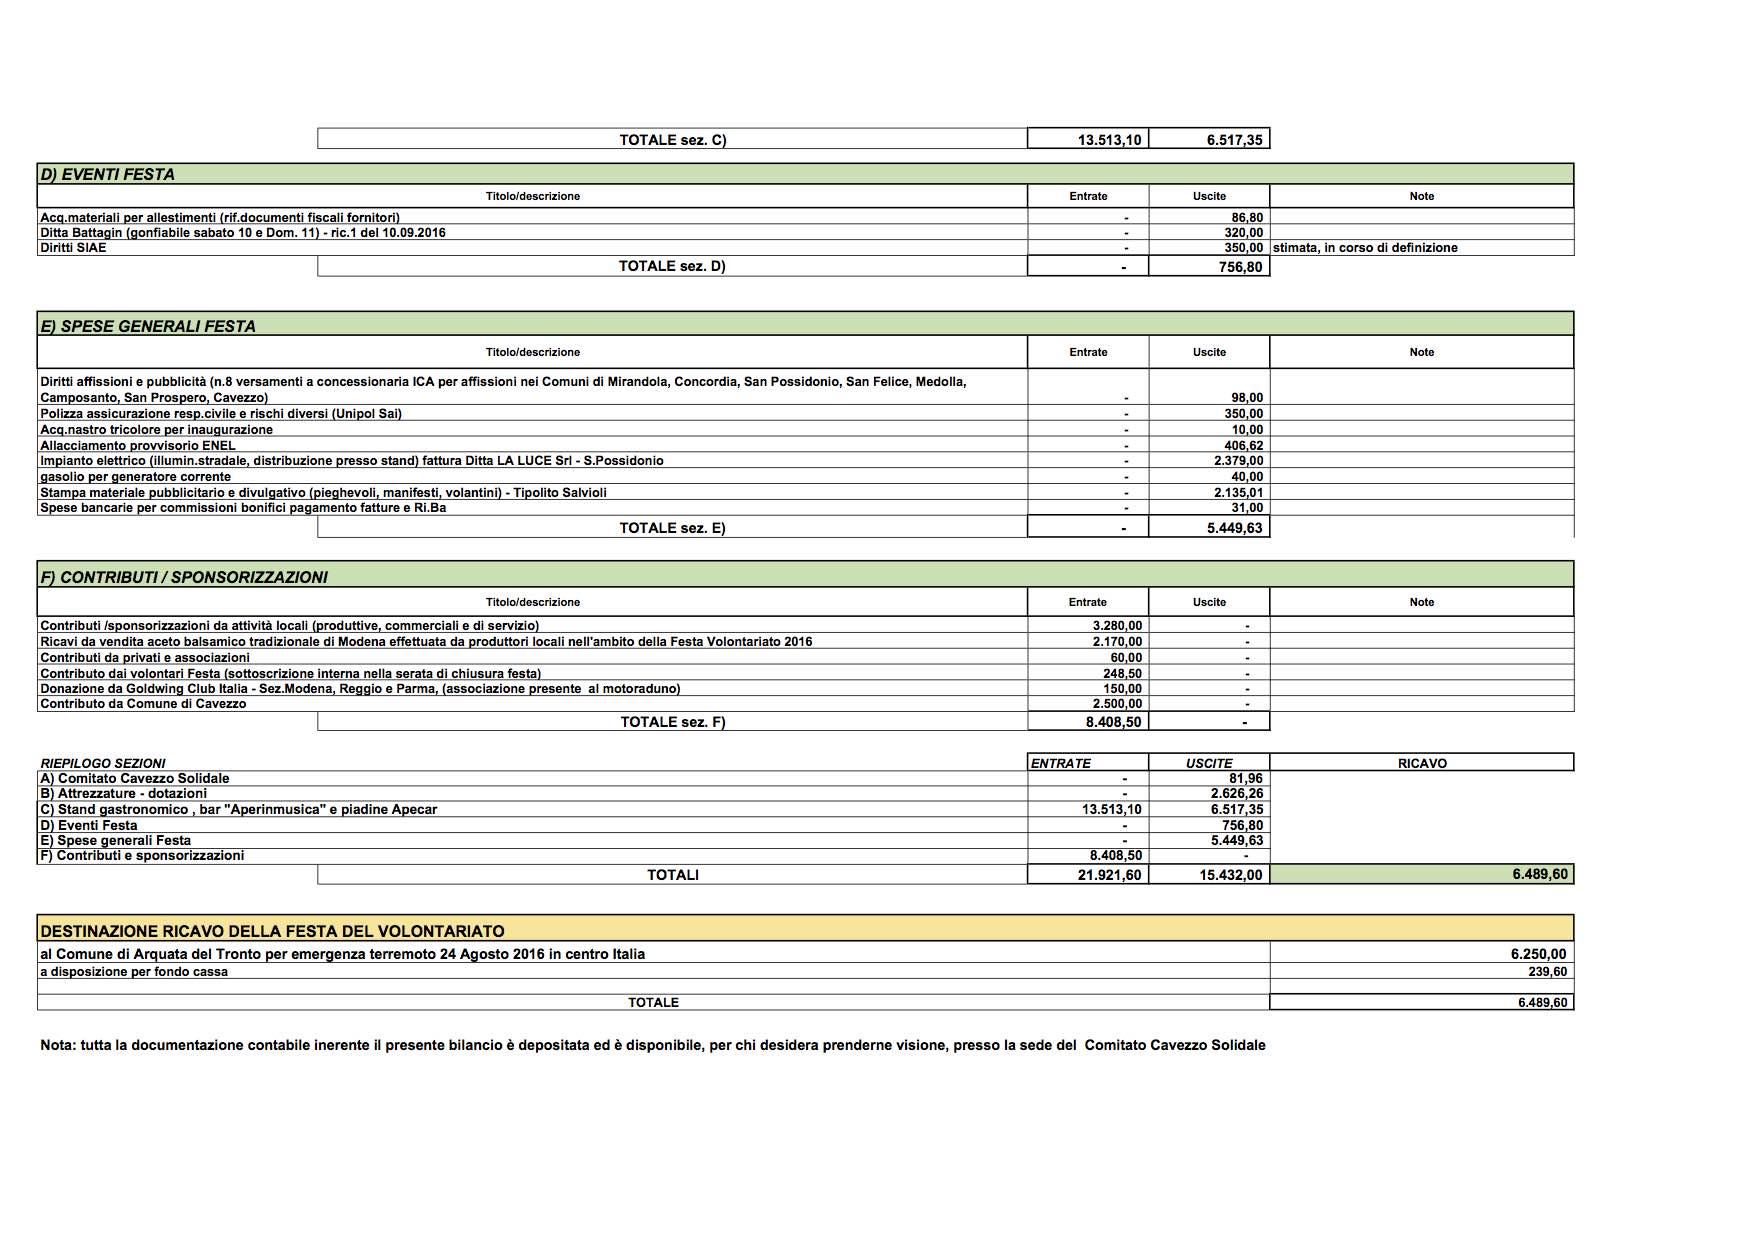 festa-volontariato-2016-bilancio-21